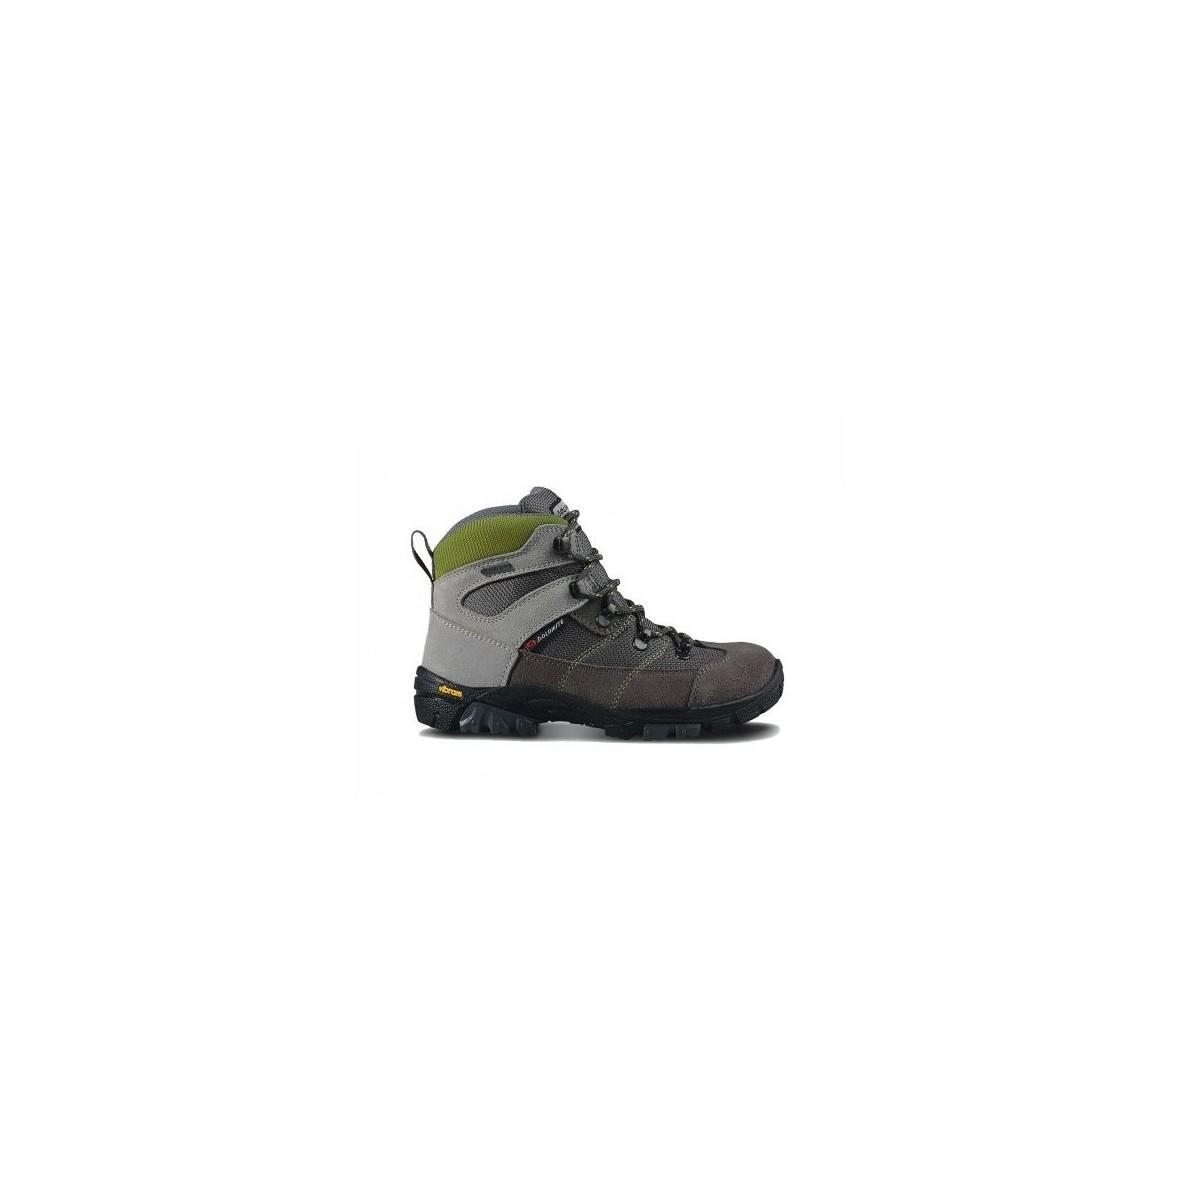 d2837662113 Trekking shoes Dolomite Flash Plus II Gtx